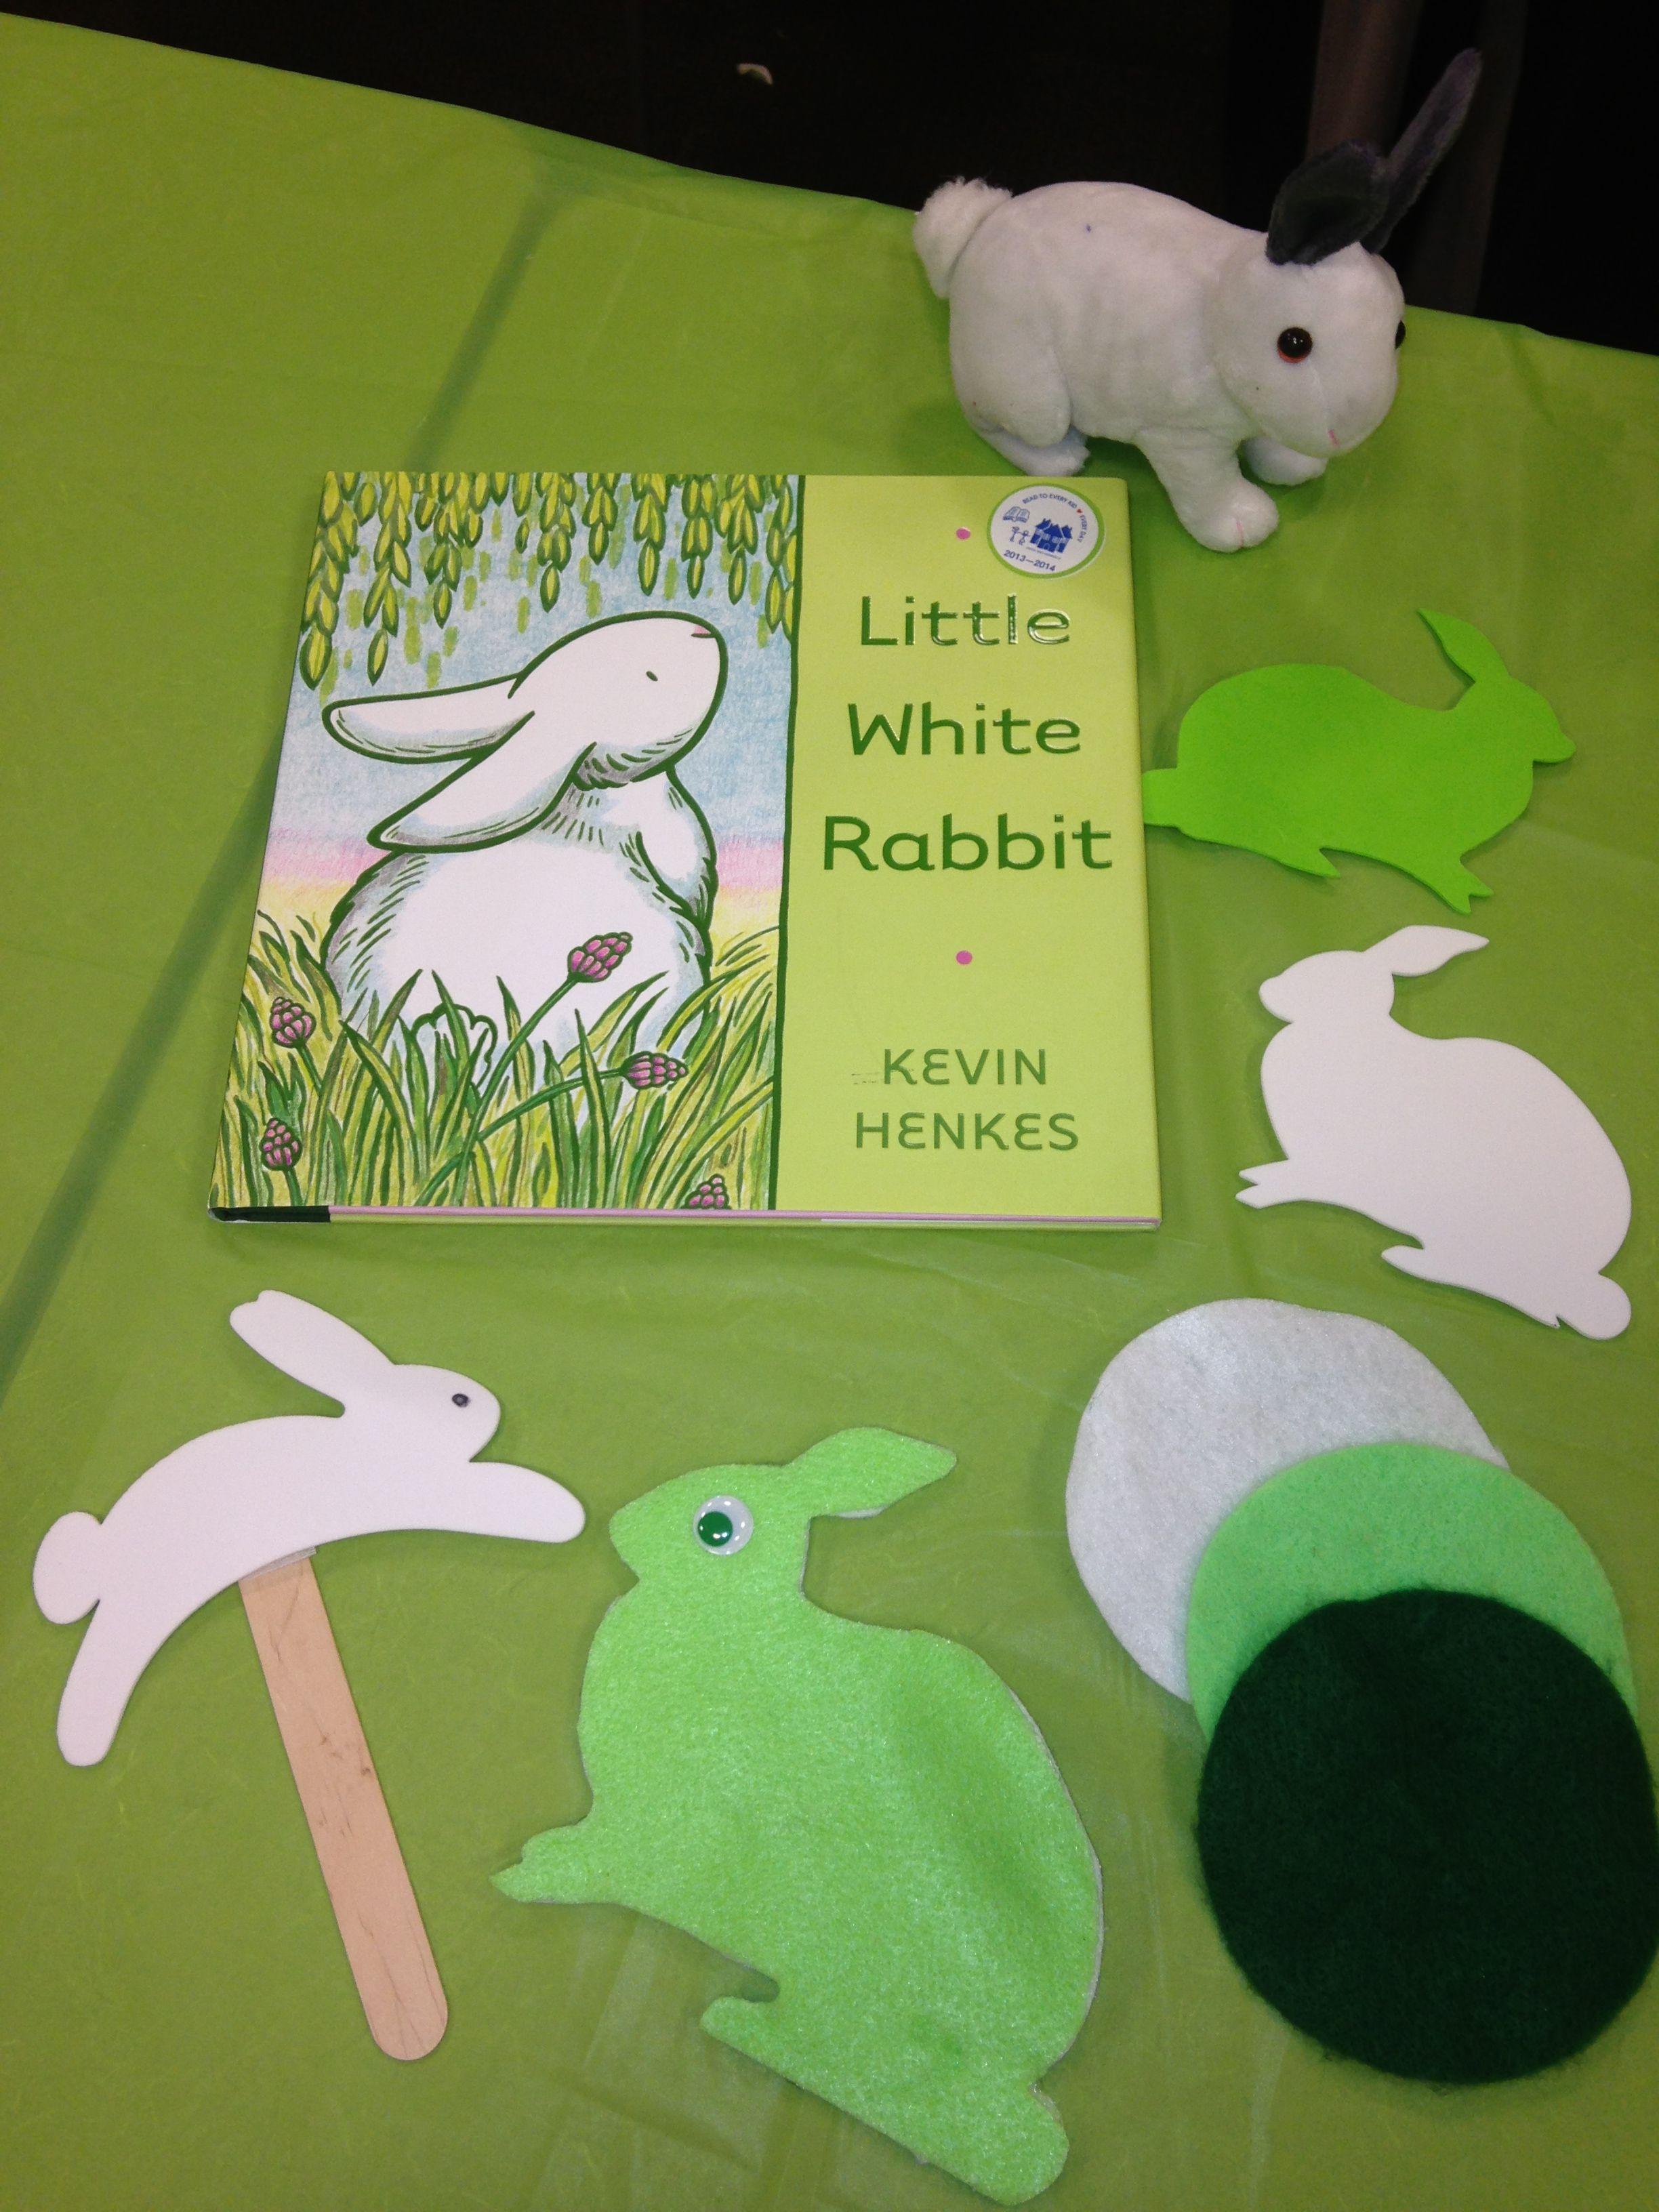 Litte white rabbit props from the Make & Take Workshops October 2013